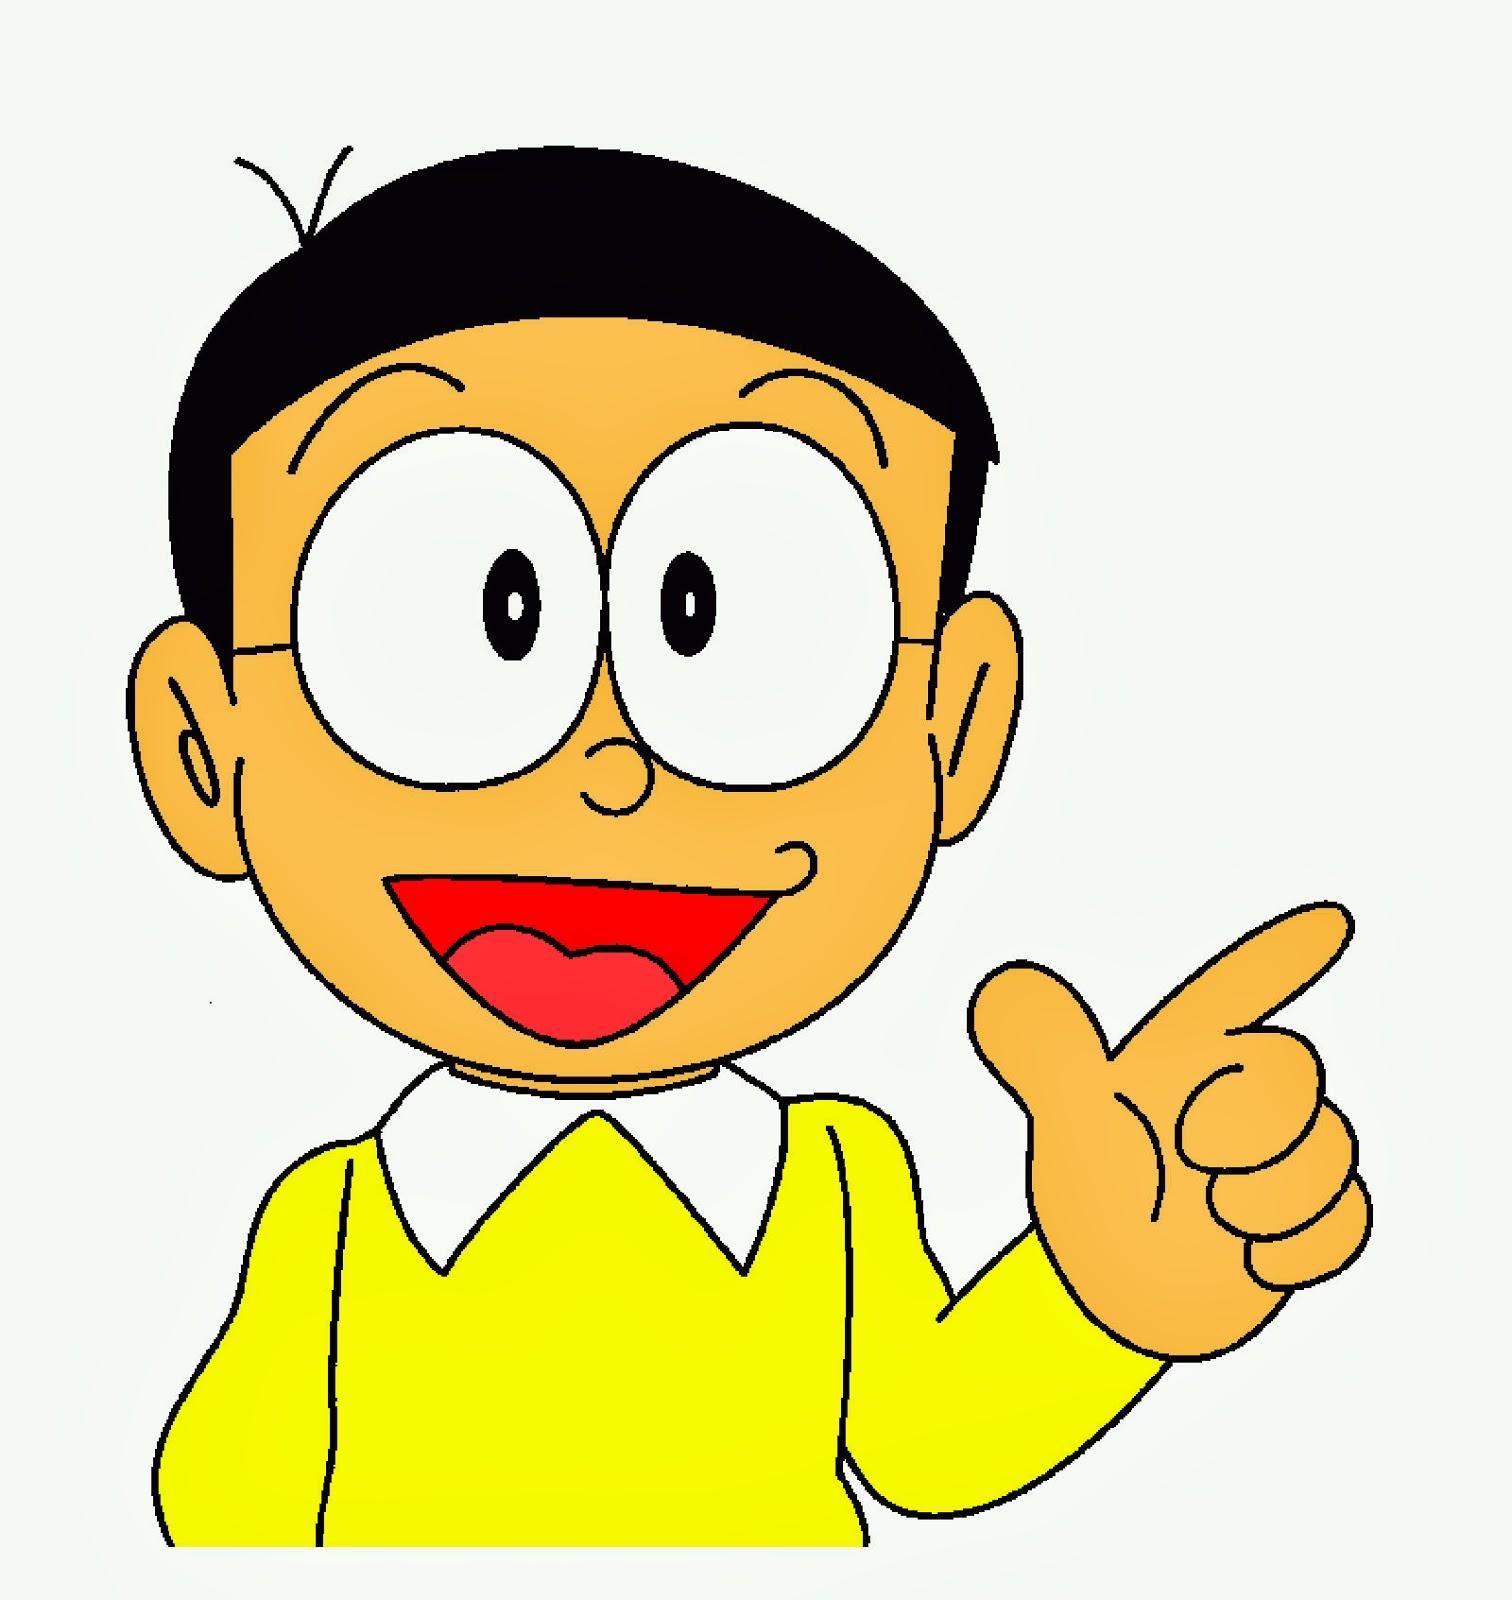 Doraemon 12 11 13